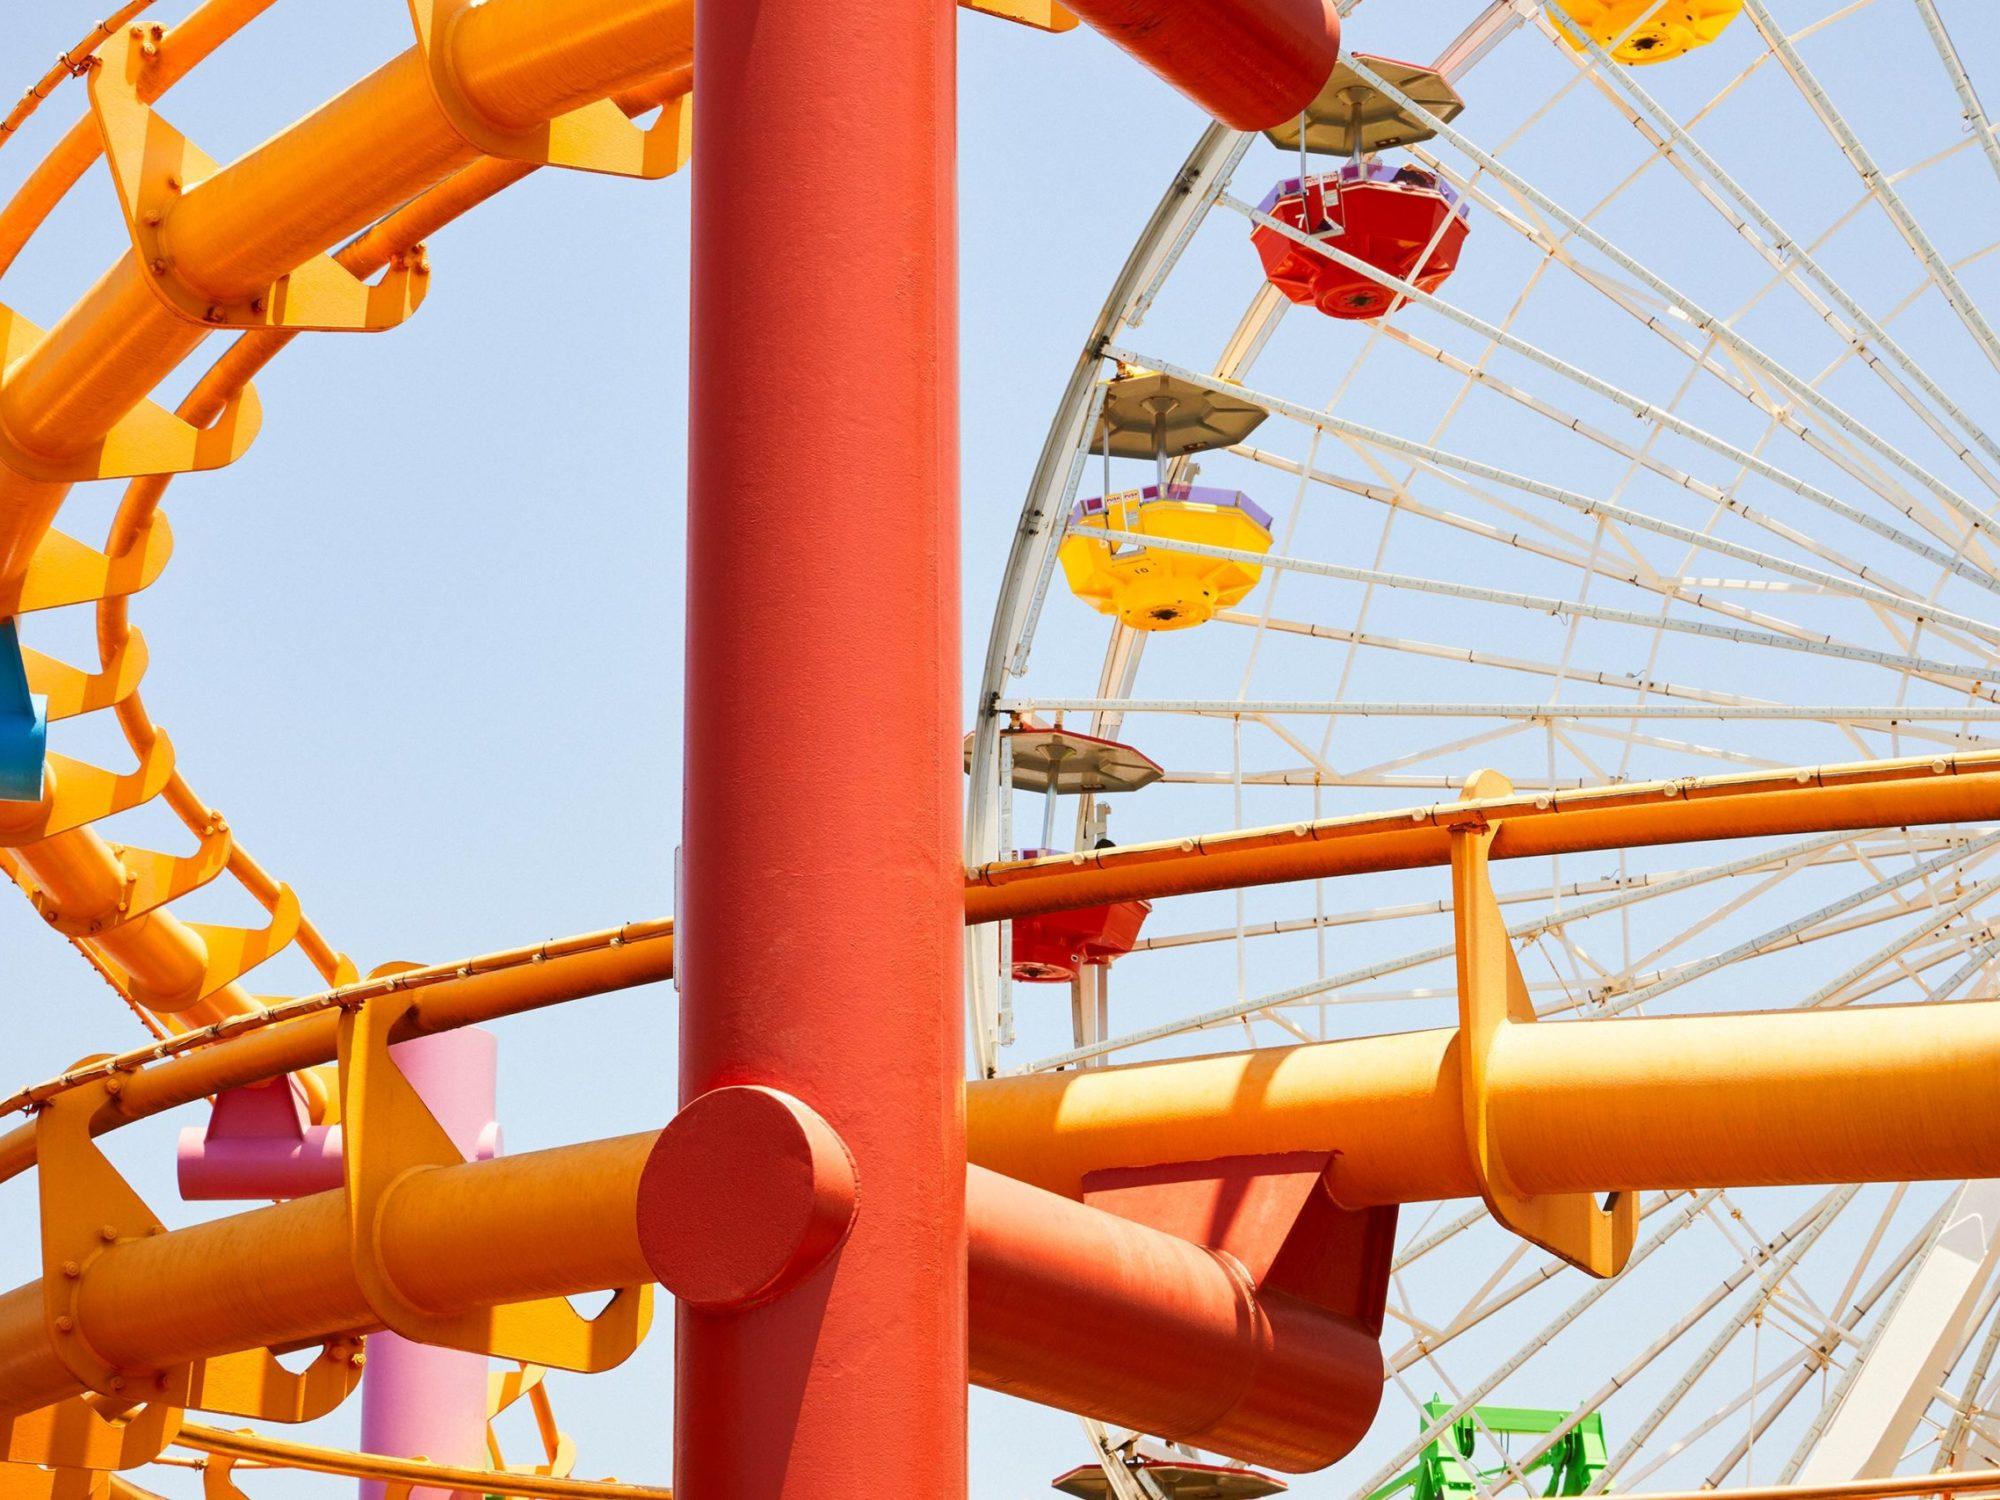 Santa Monica Pier 1 - Carnival Collection - Fine Art Photography by Toby Dixon